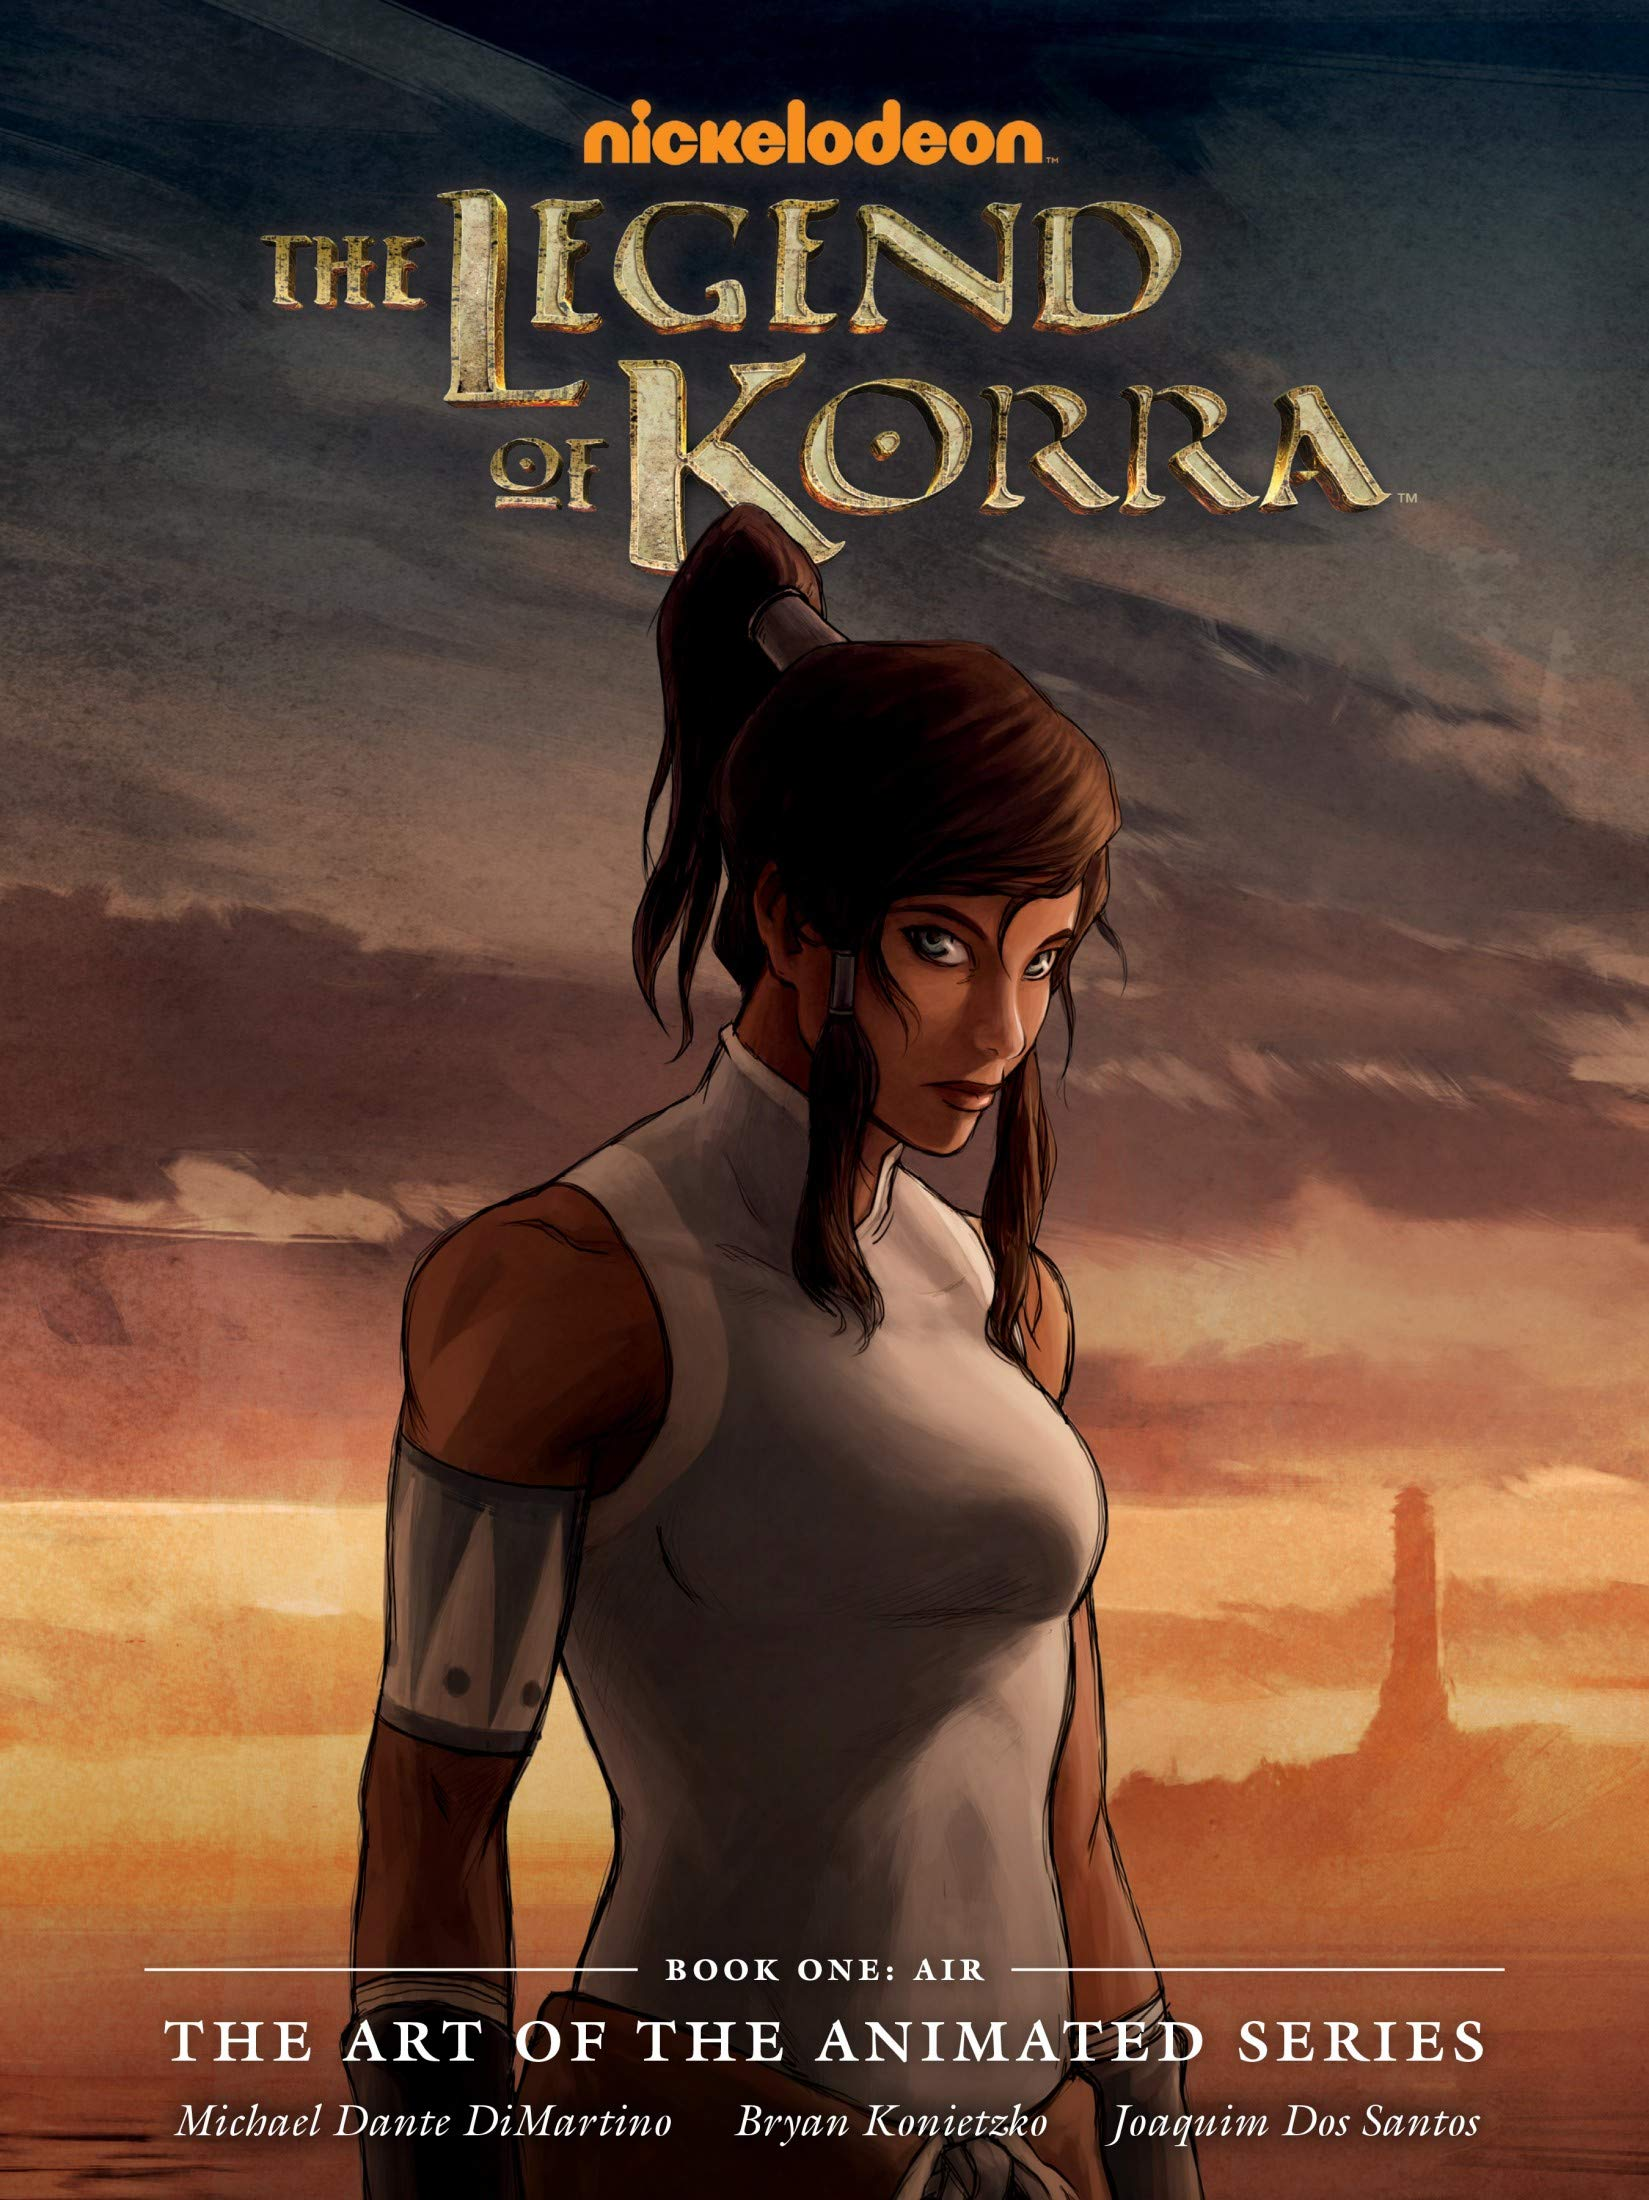 Korra: Legend - Vol 1 Great Adventure Comic Avatar The Legend Graphic Novels Of Korra For Young & Teens , Adults